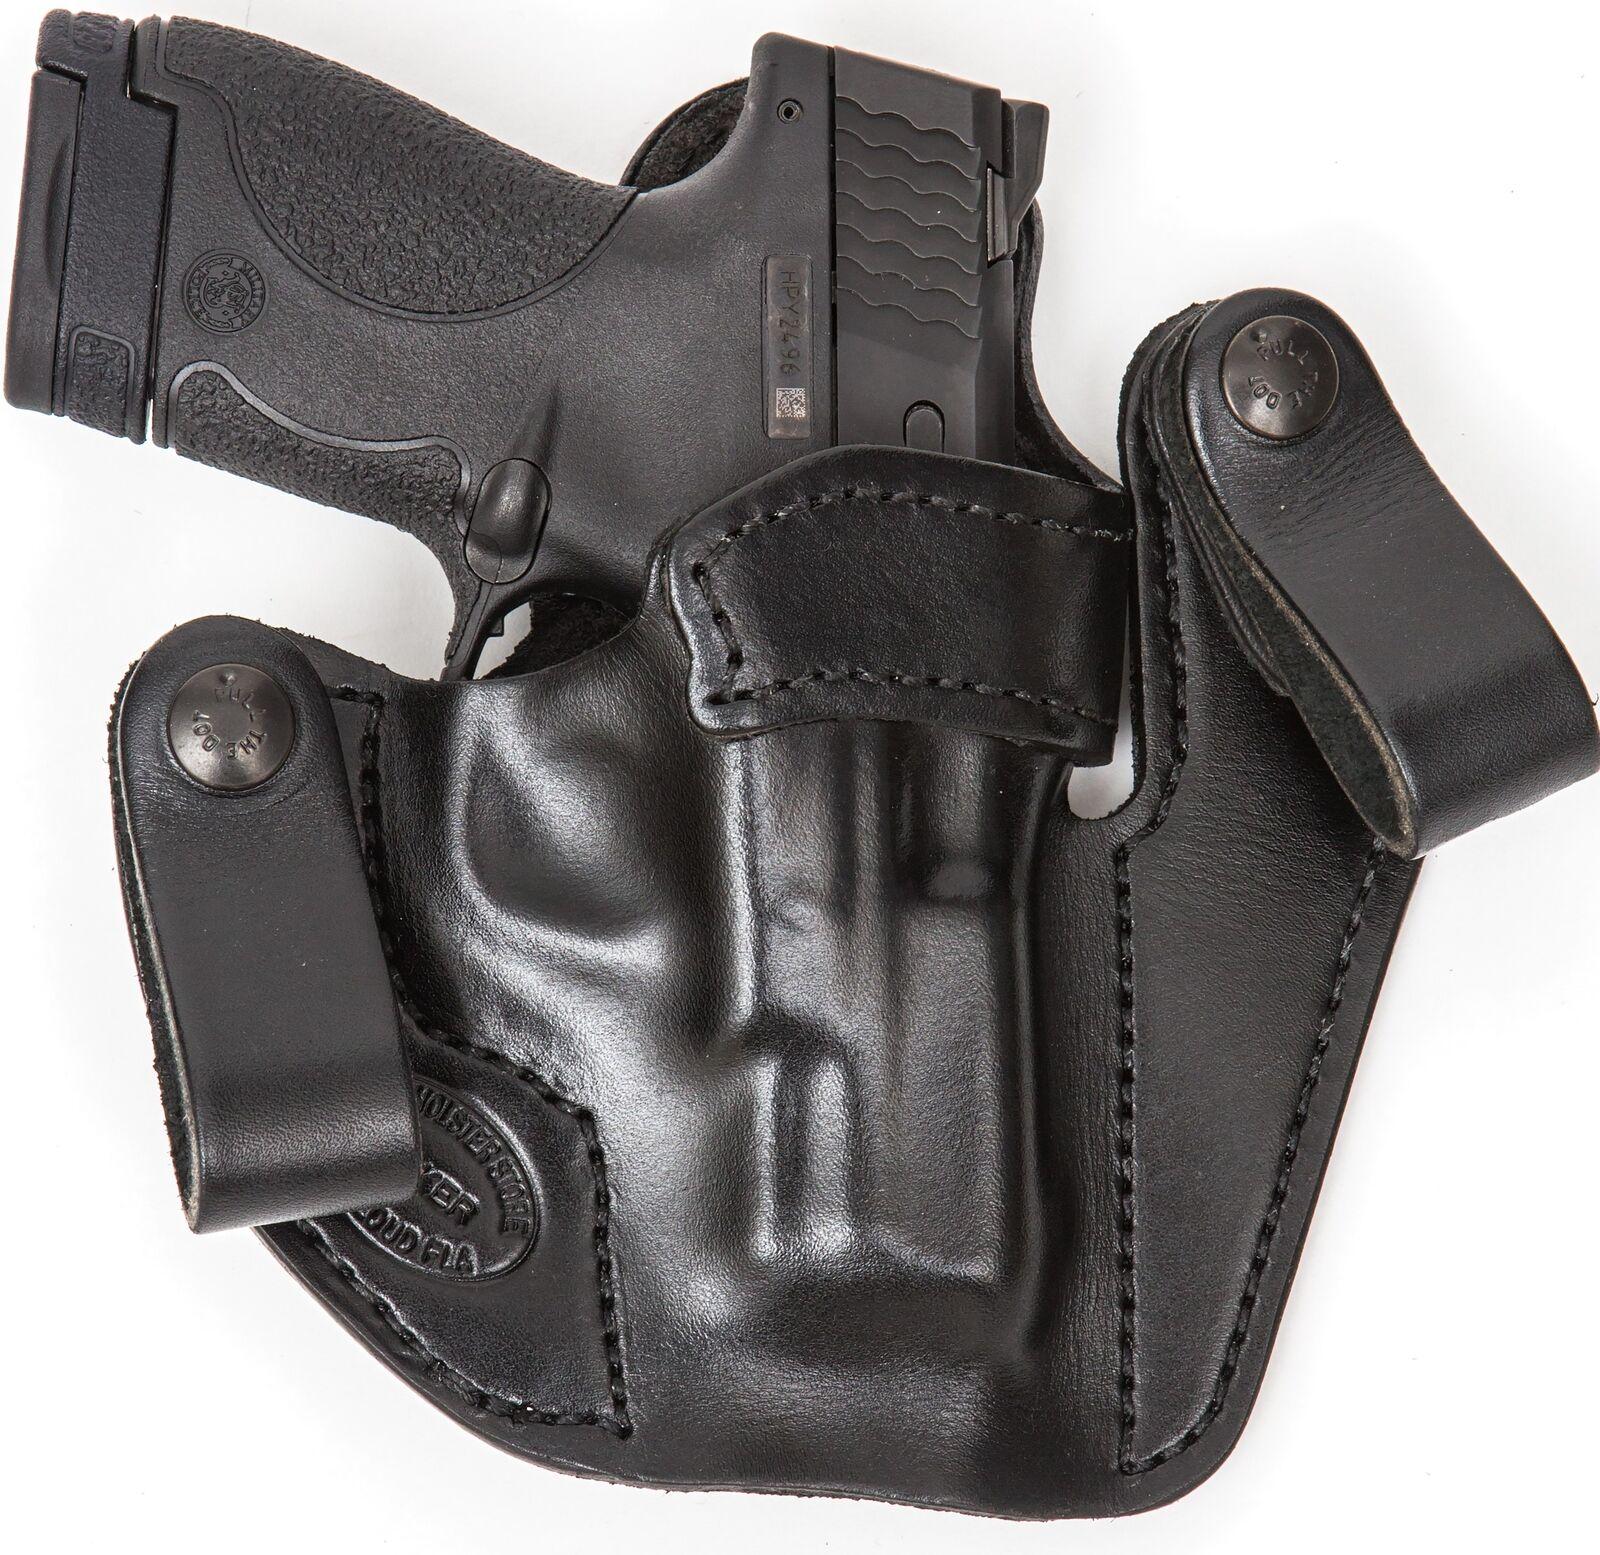 Xtreme llevar RH LH IWB Cuero Funda Pistola para para de jabalí